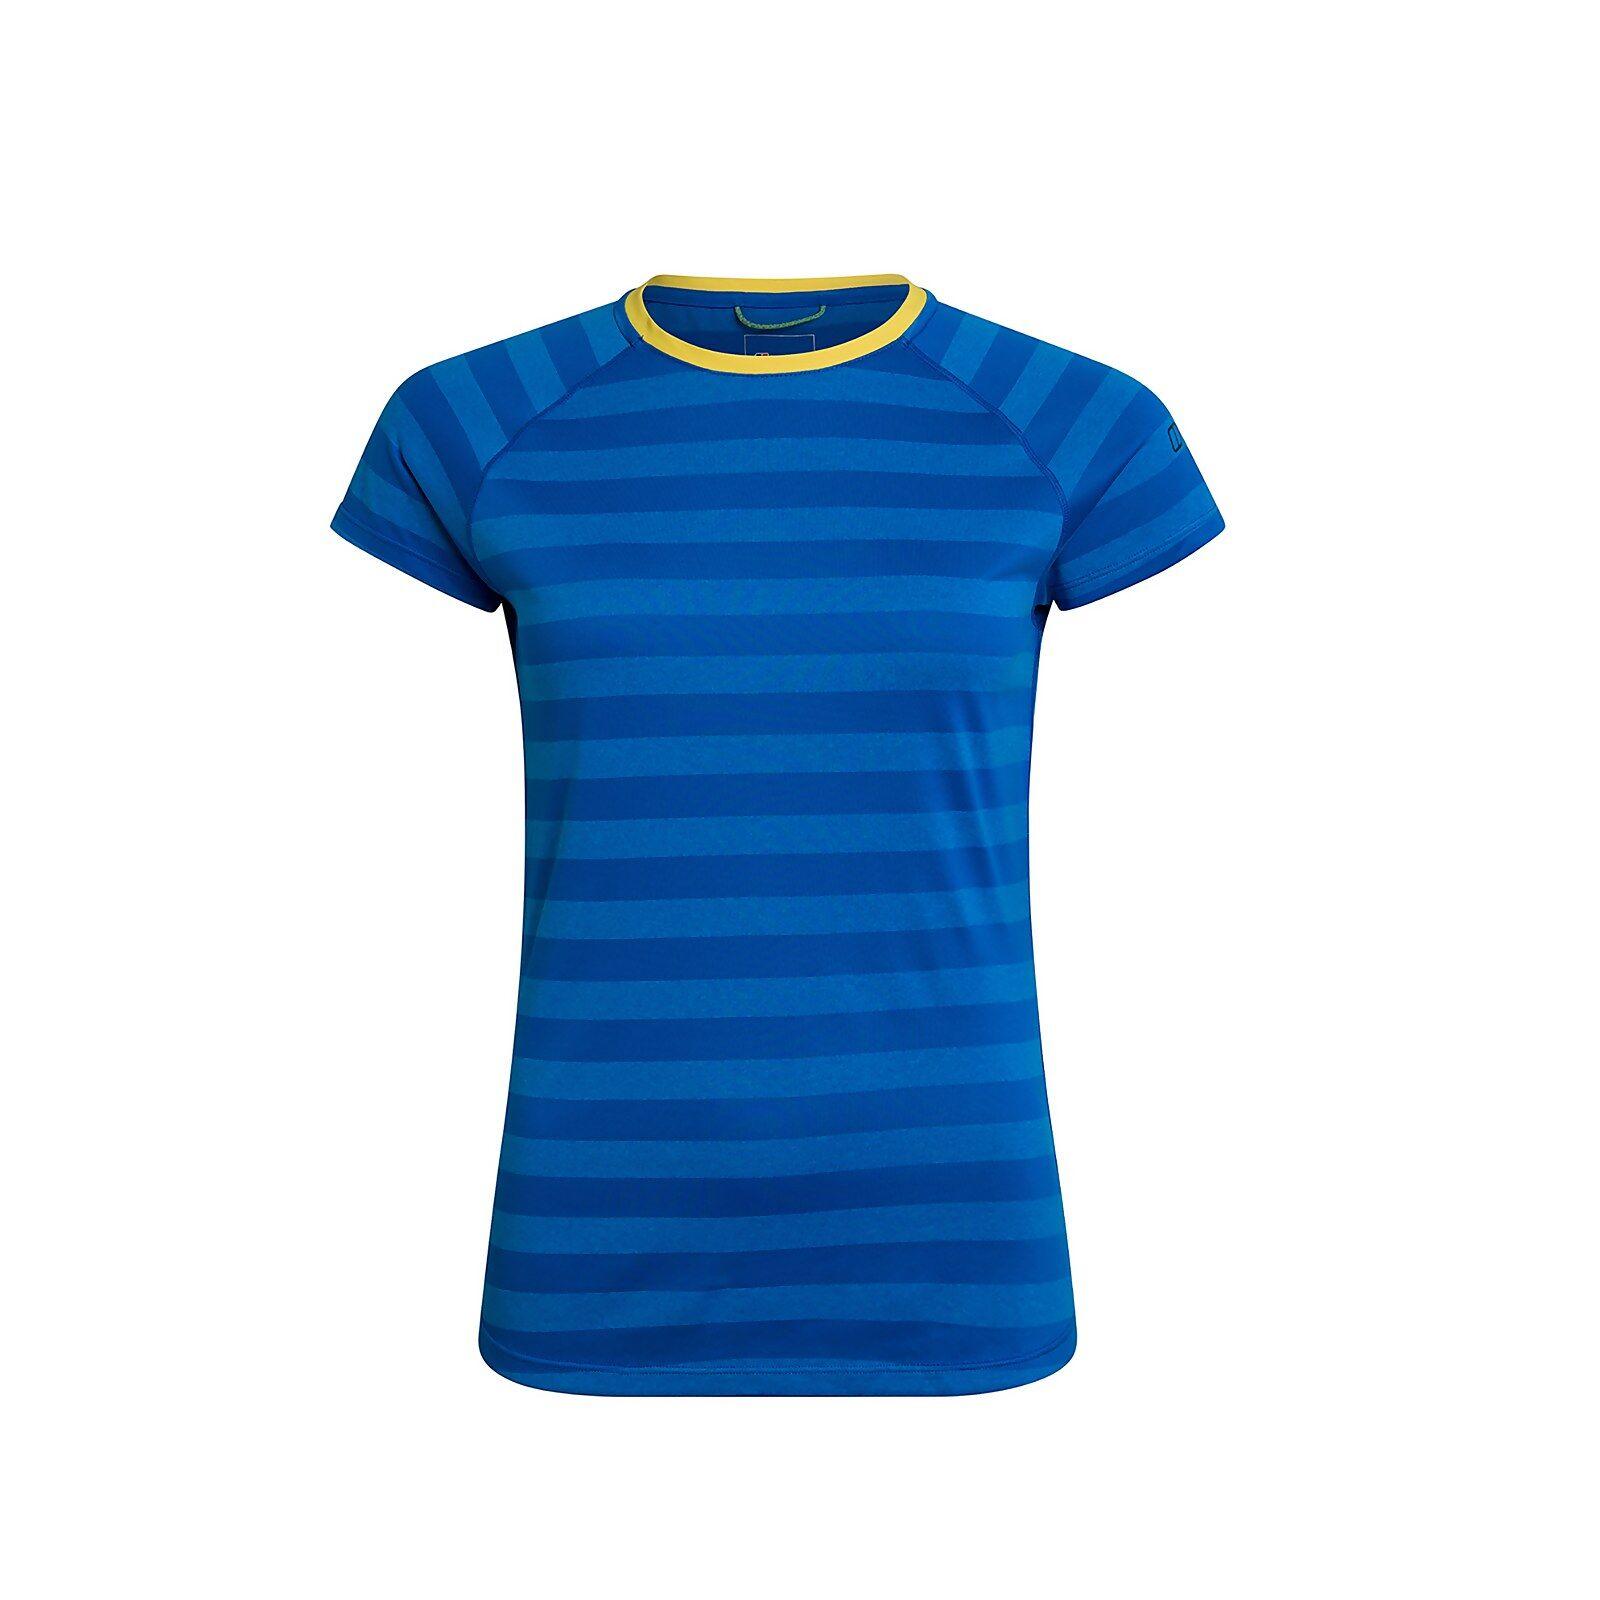 Berghaus Women's Stripe Tech Tee 2.0 - Blue - 16  - Size: 16